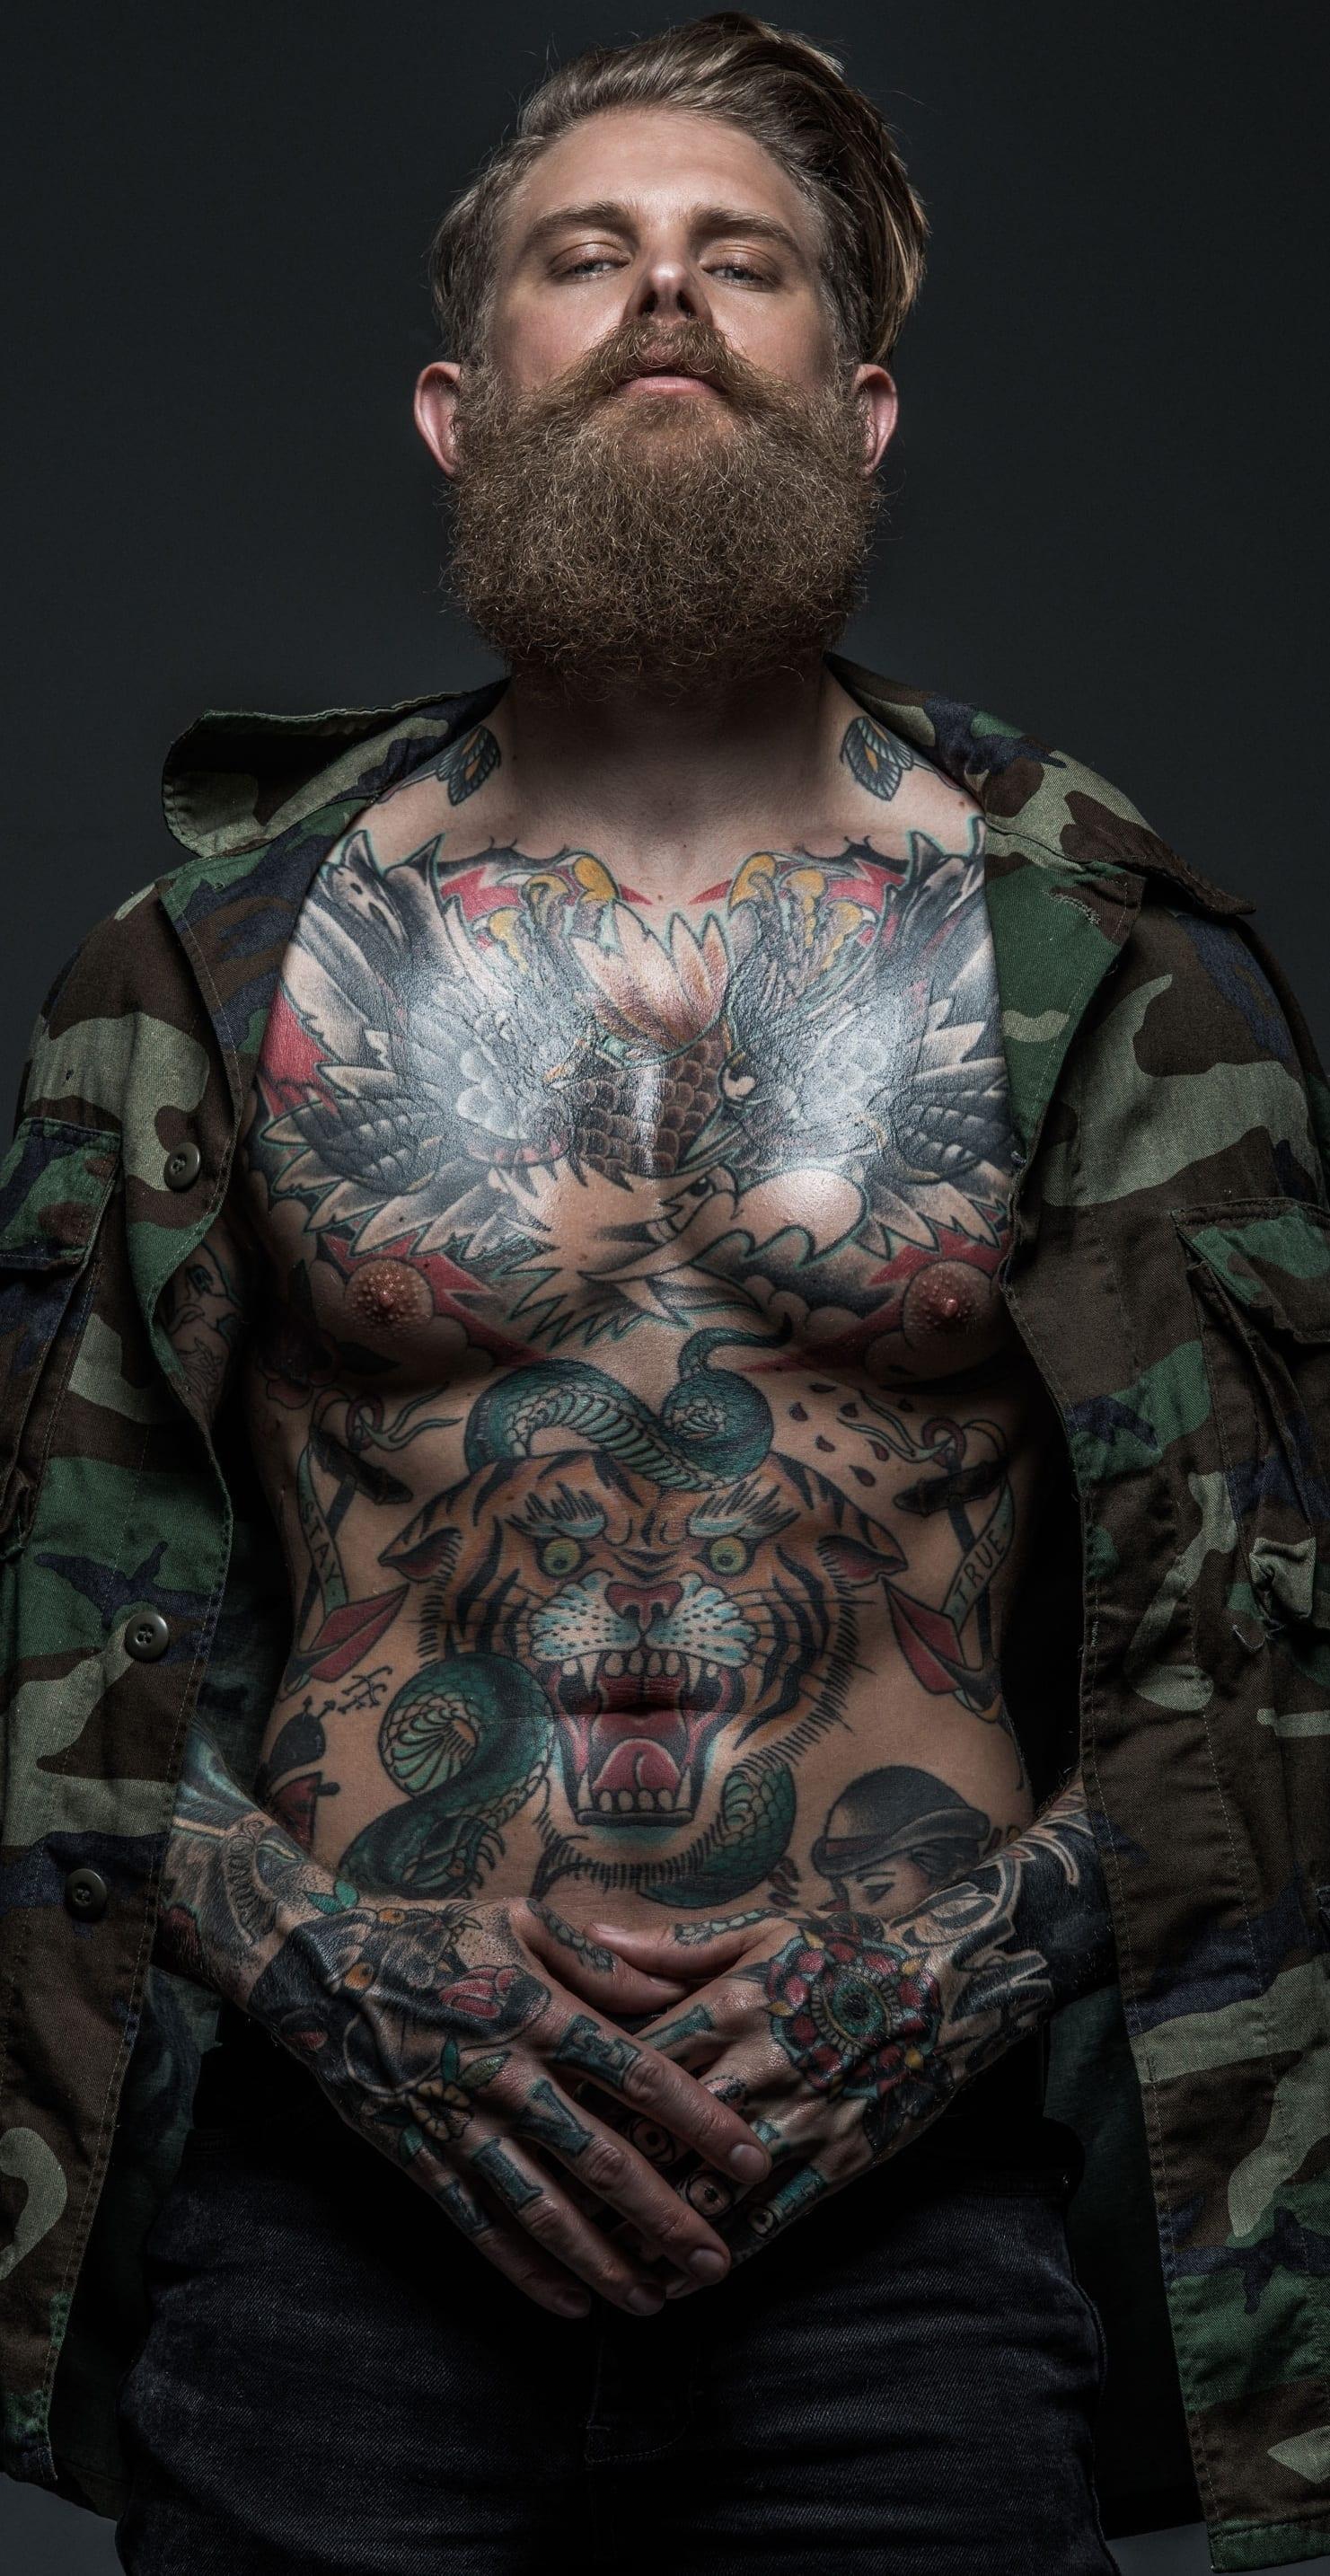 Josh Mario John tattoo